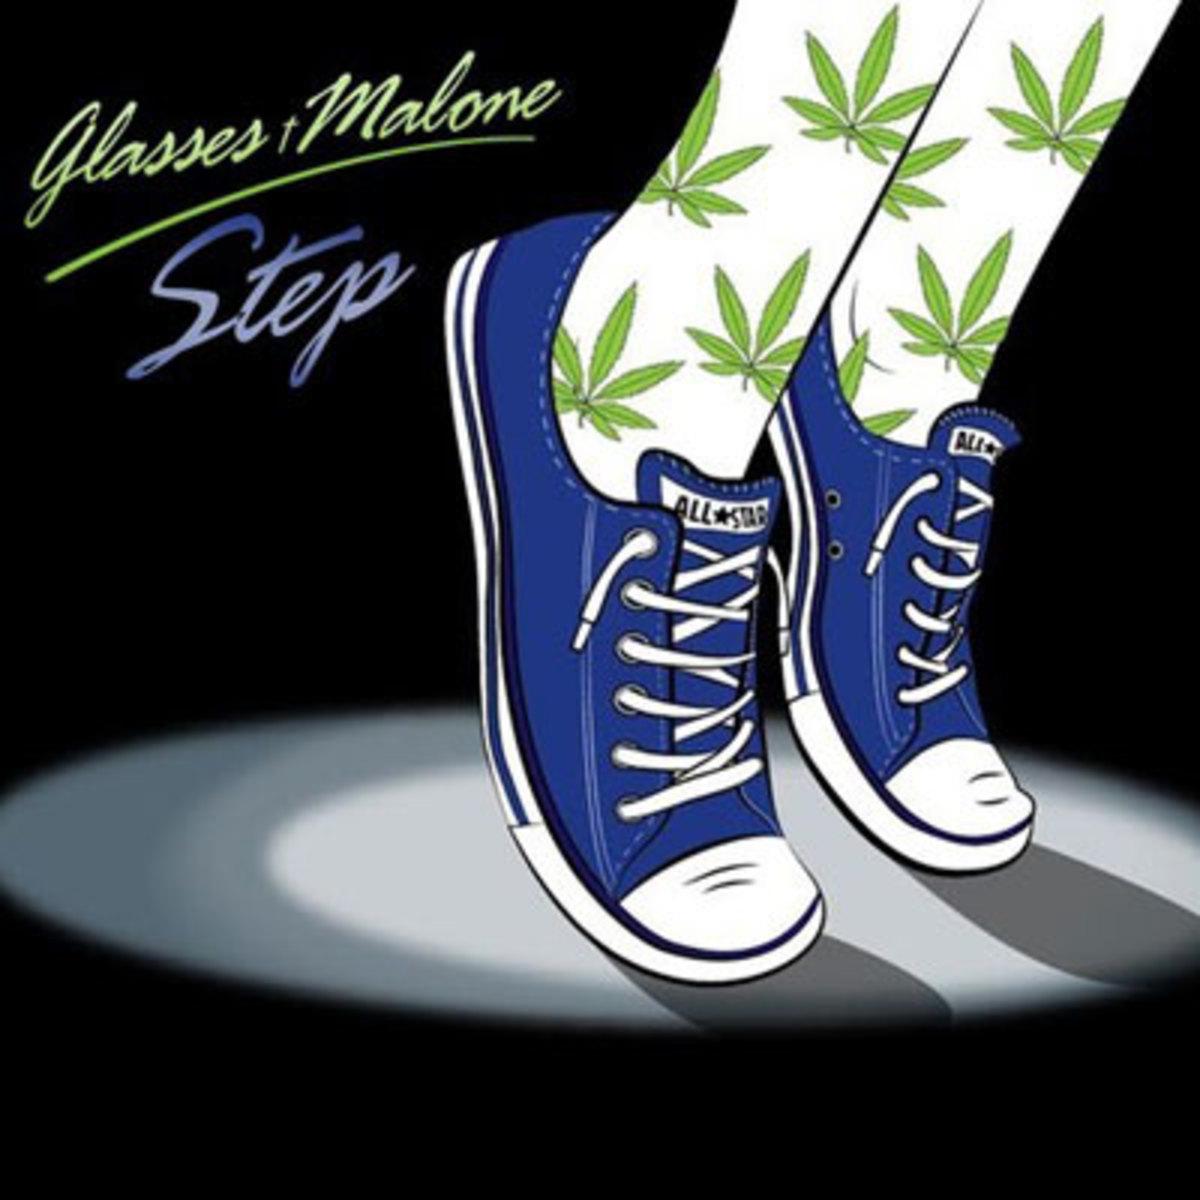 gmalone-step.jpg